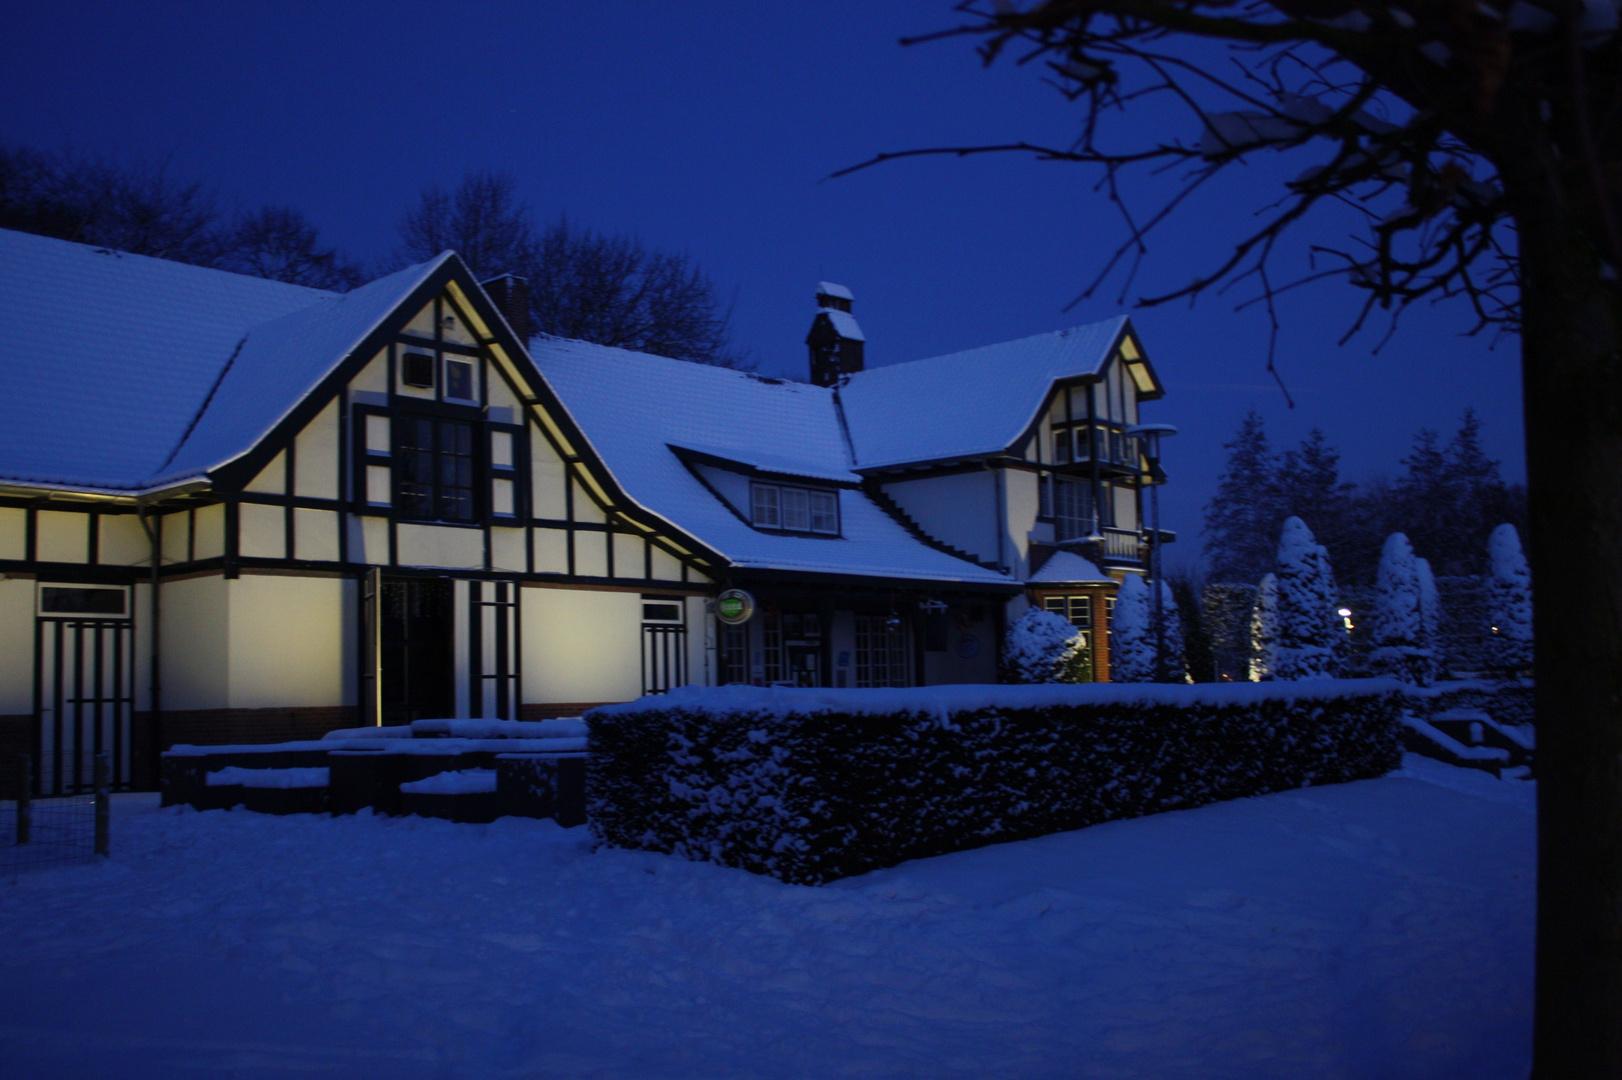 English Farmhouse in the snow